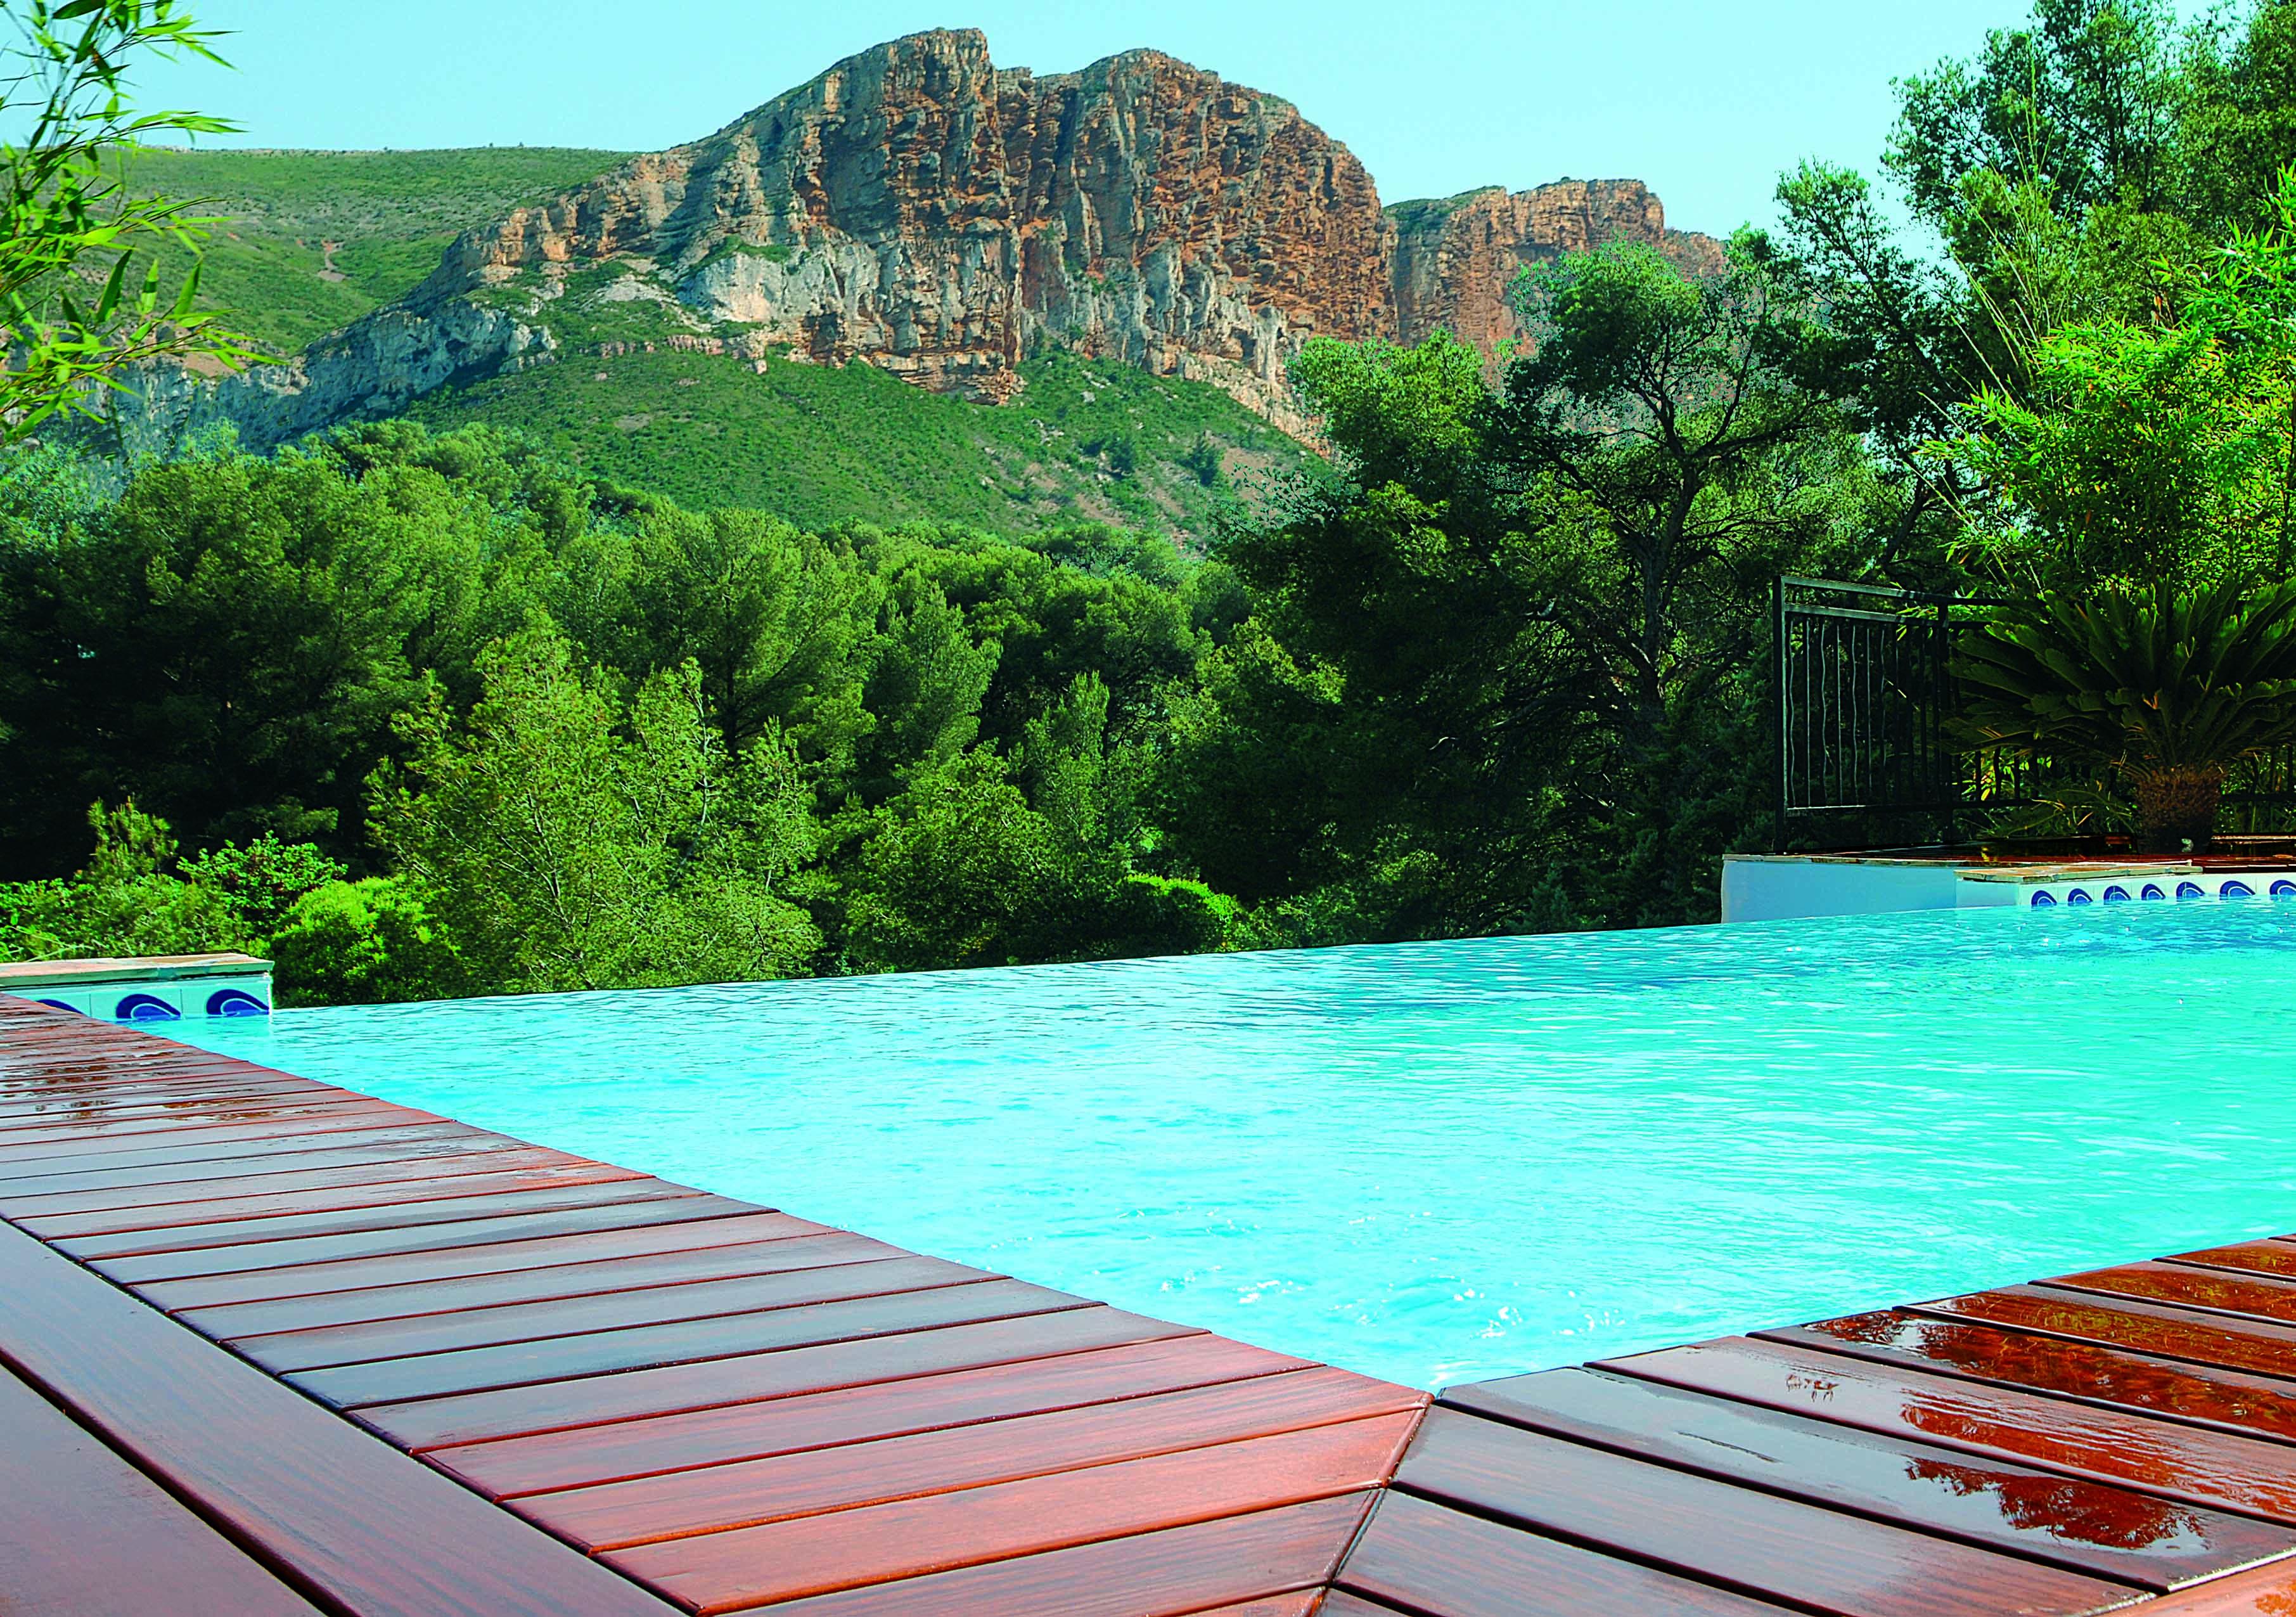 Cascade piscine desjoyaux - Cascade d eau piscine ...